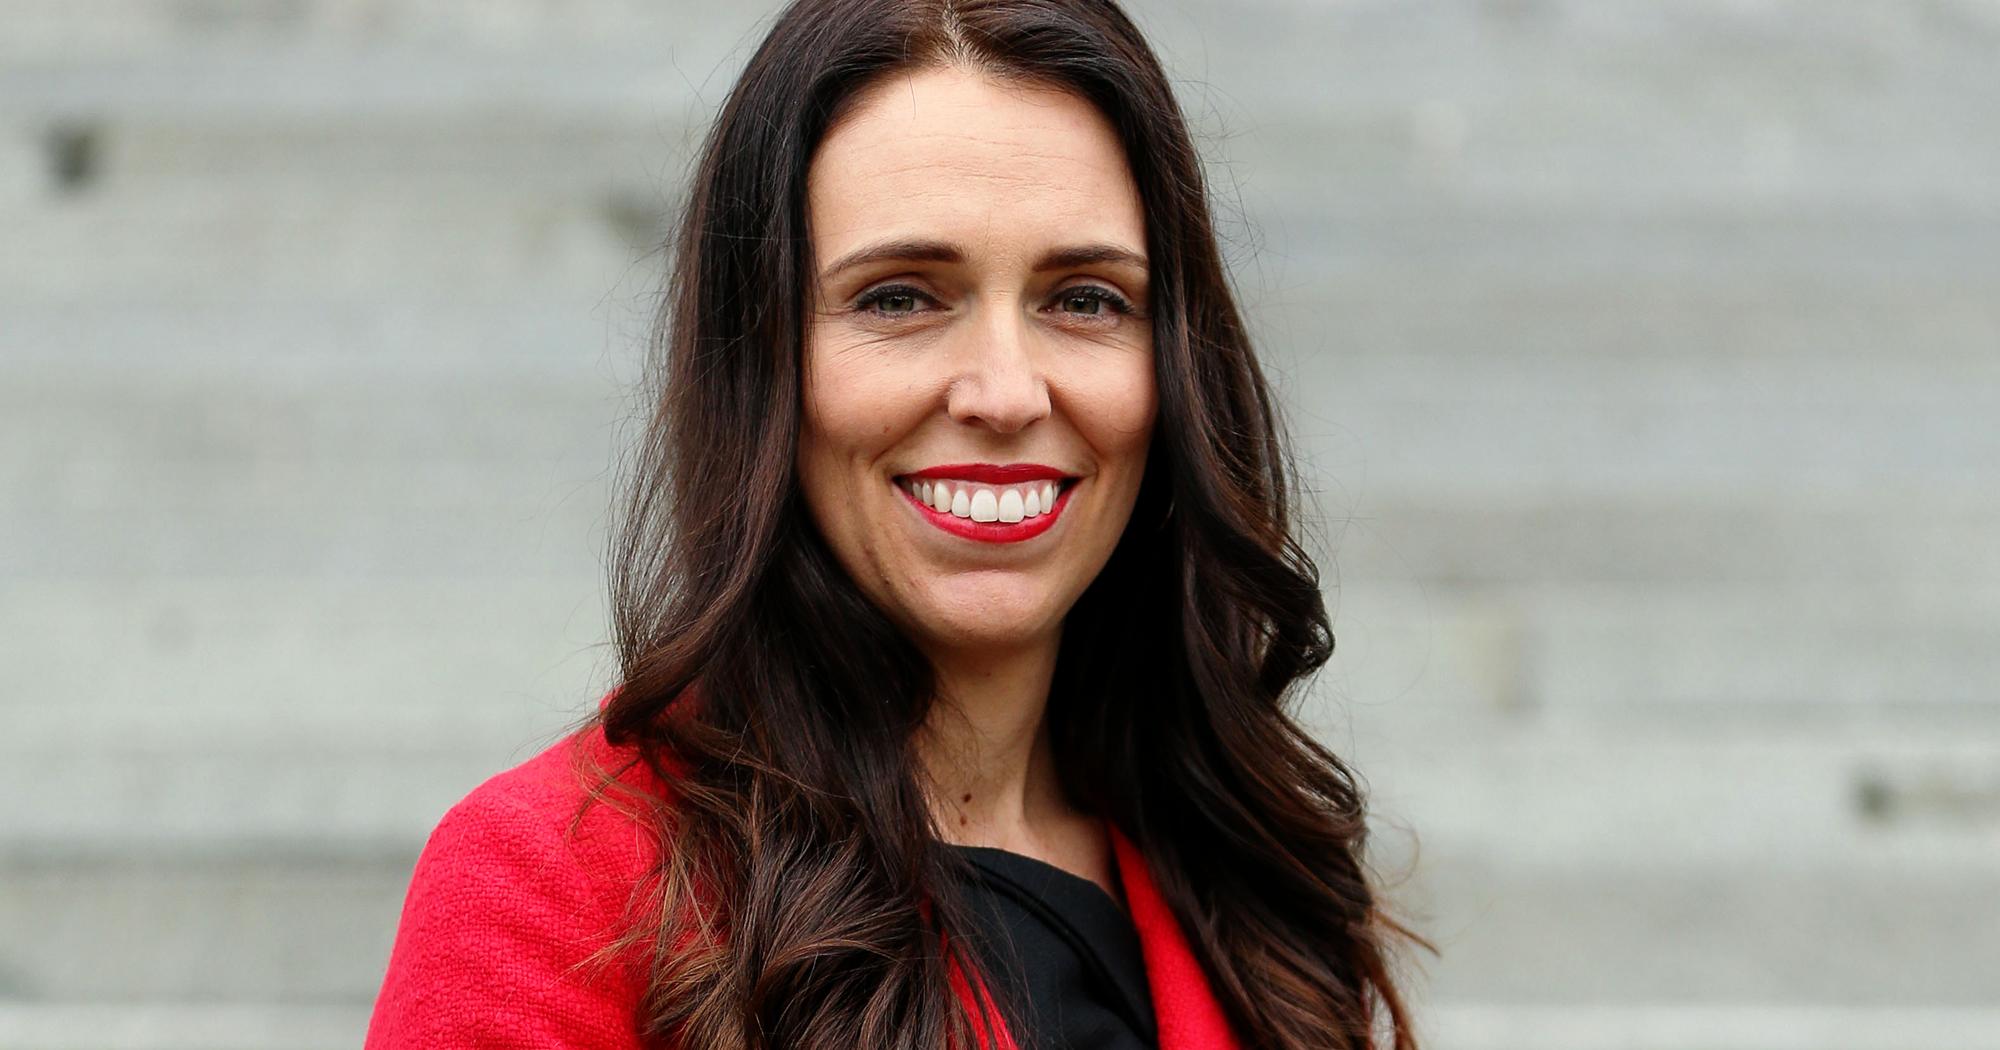 New Zealand Leader Jacinda Ardern Baby Plans Question